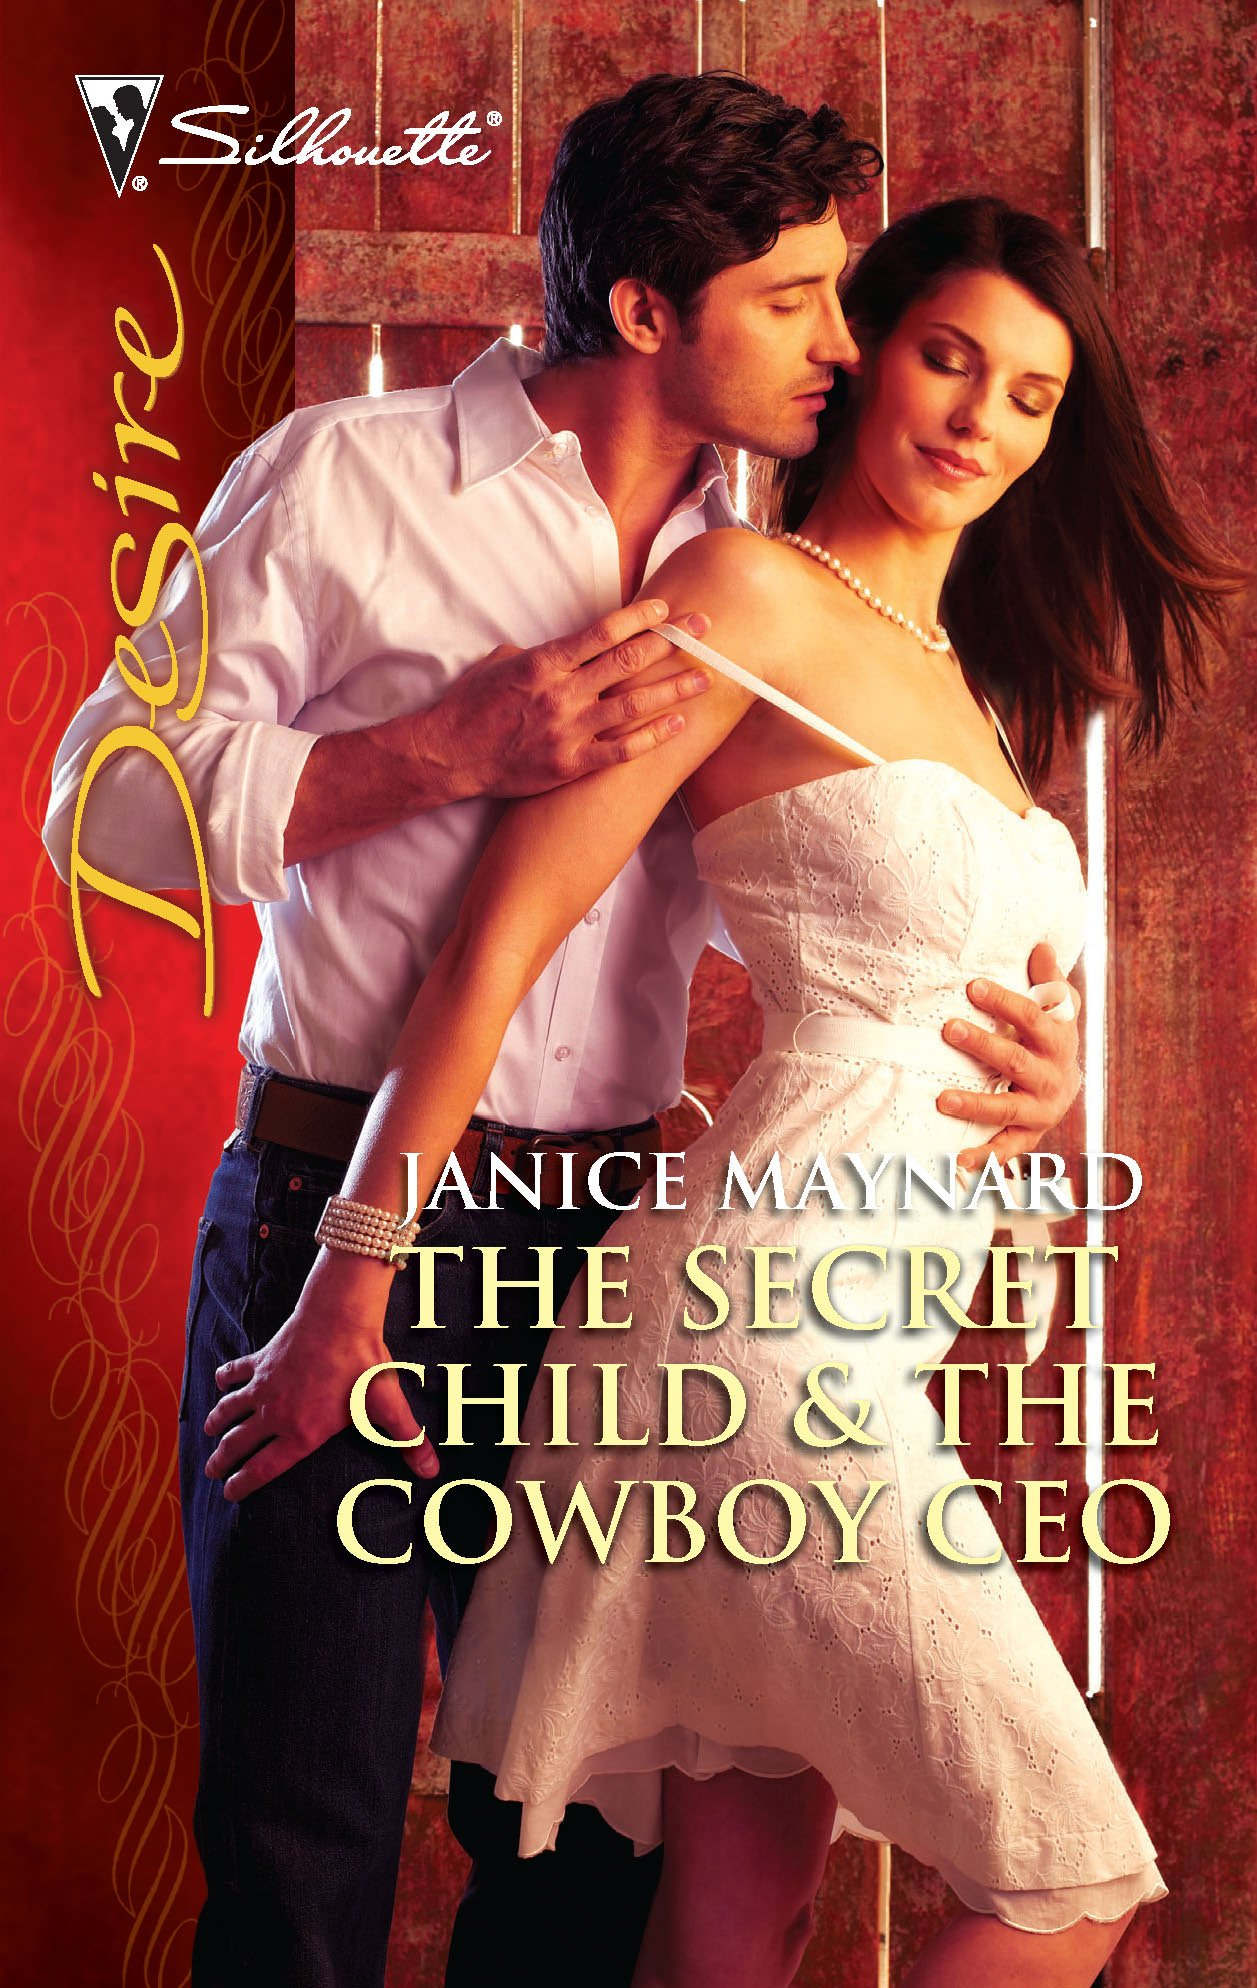 Download The Secret Child & The Cowboy CEO (Harlequin Desire) PDF